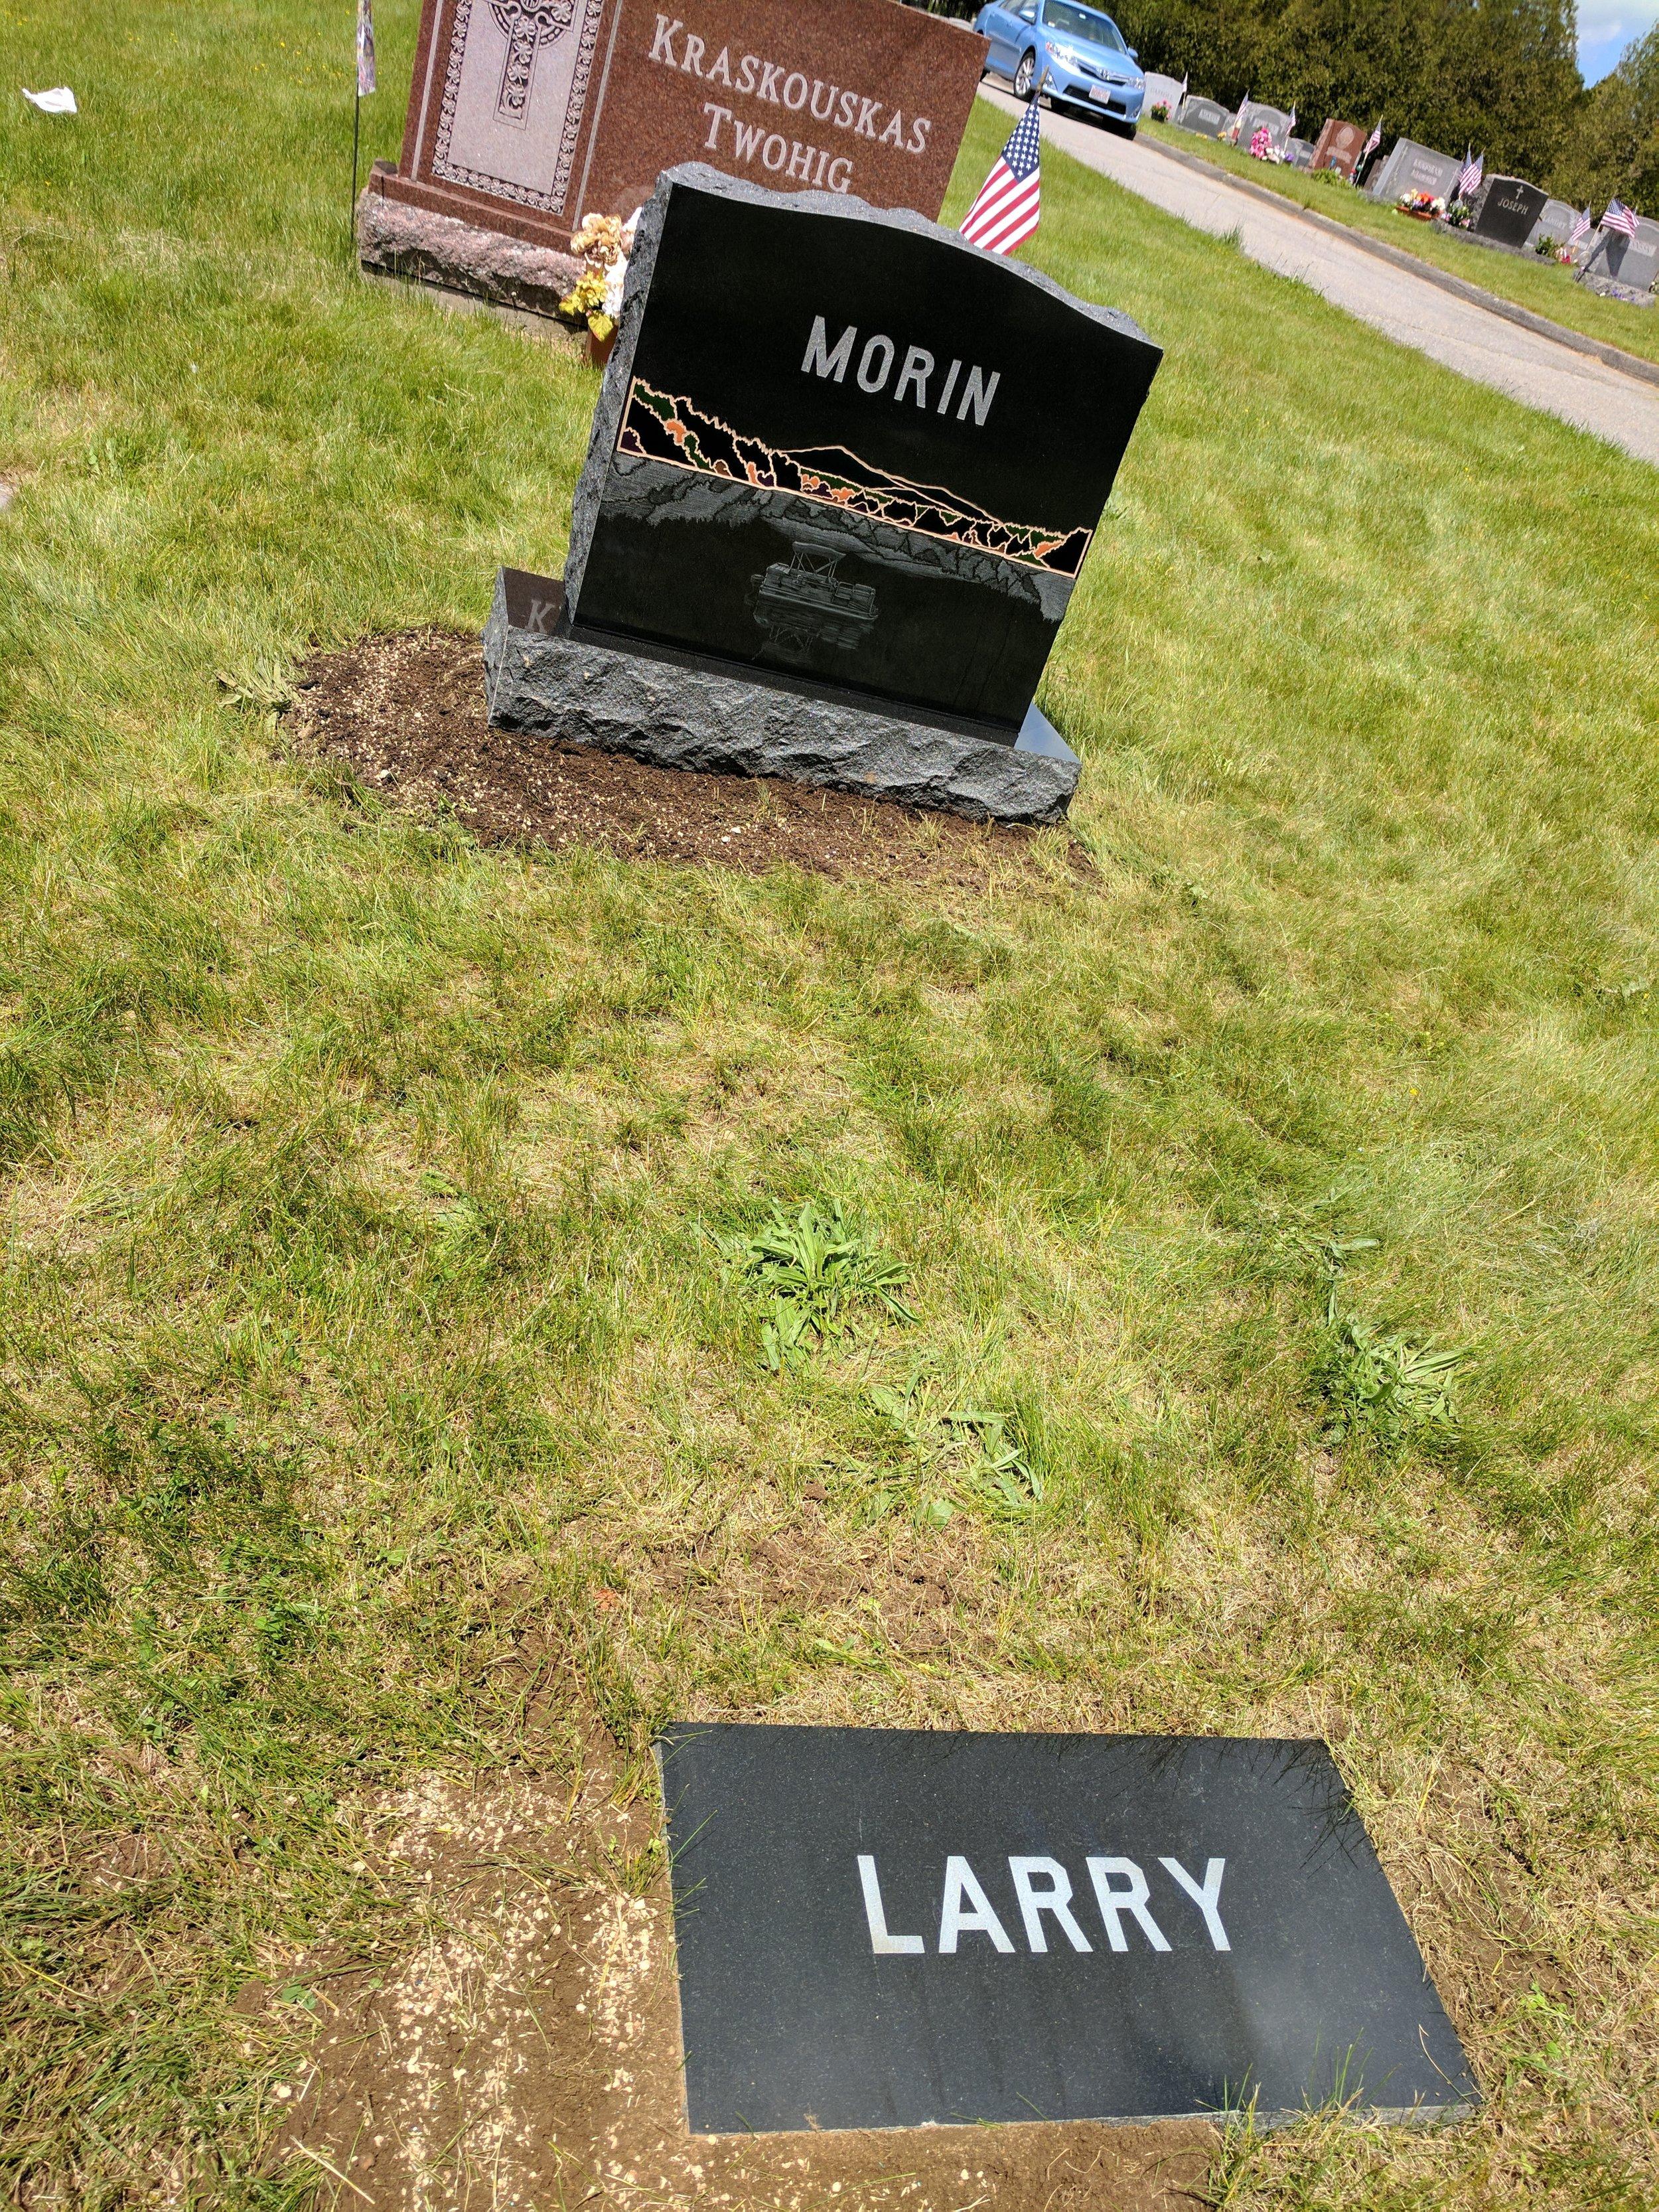 Complete memorial set in cemetery